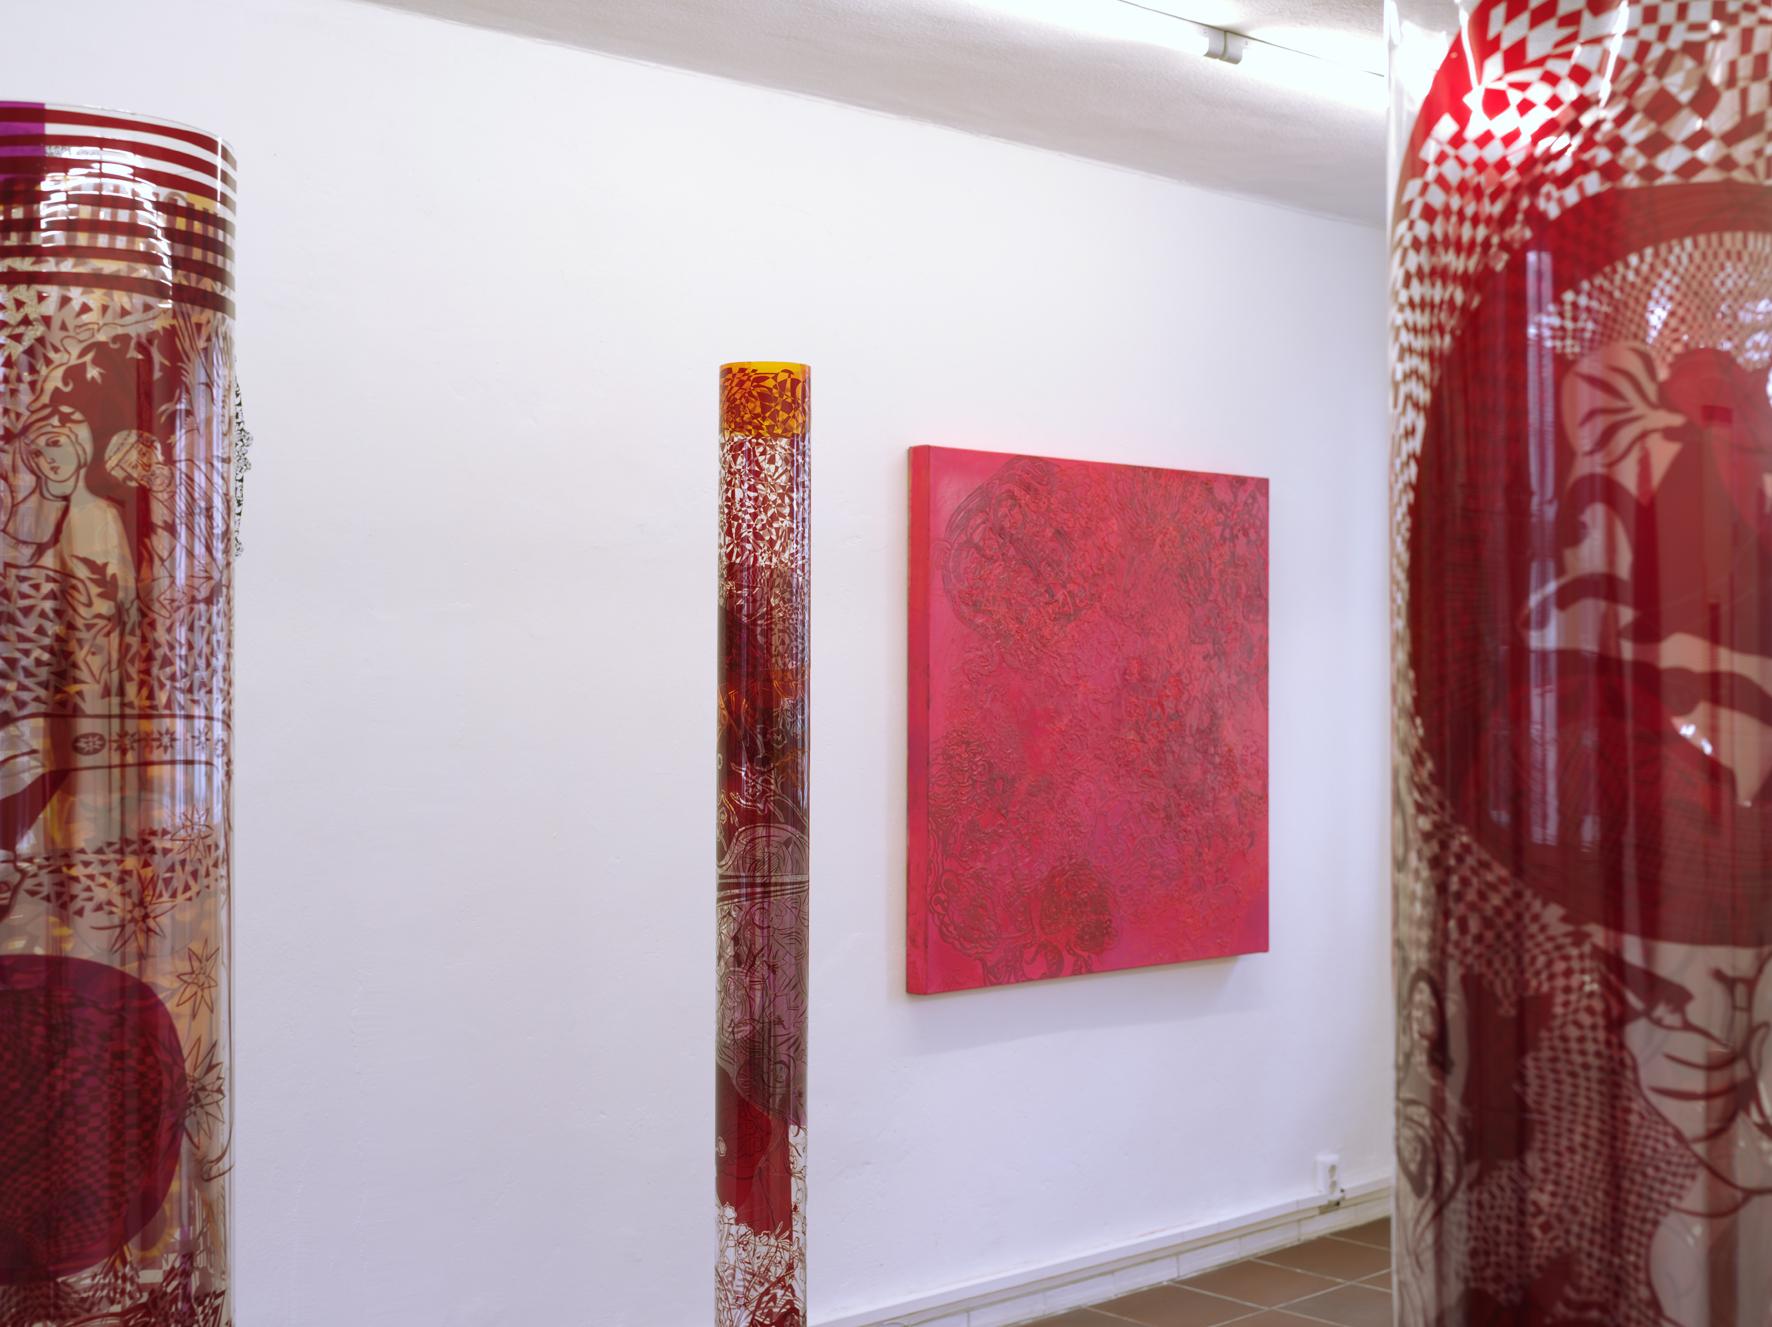 """Klostermosaik"", 2012, 120 x 120 cm, Öl auf Leinwand, ""Sounds of Silence"" 2013, Bräuning Contemporary, Hamburg (Foto: Ralf Timm)"